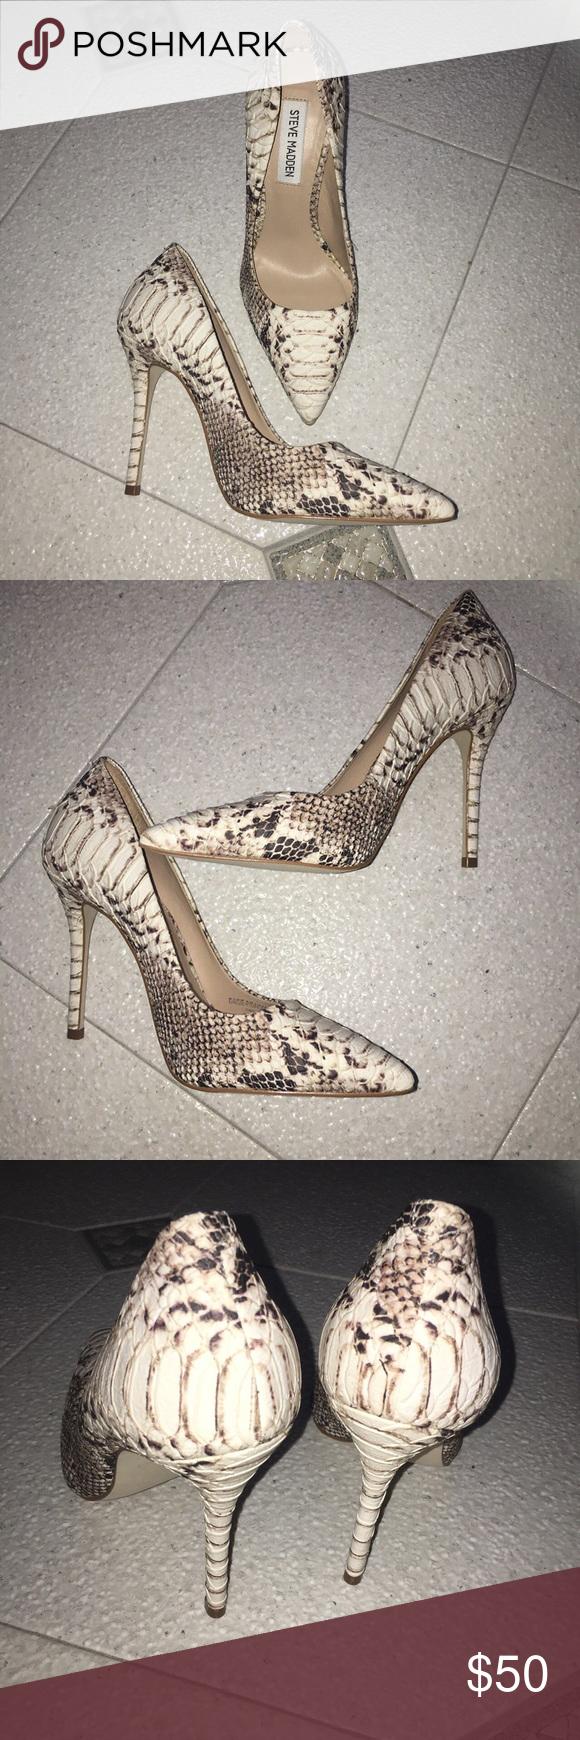 80c2370022c Steve Madden Shoes | Sexy Steve Madden Python Snakeskin High Heels ...